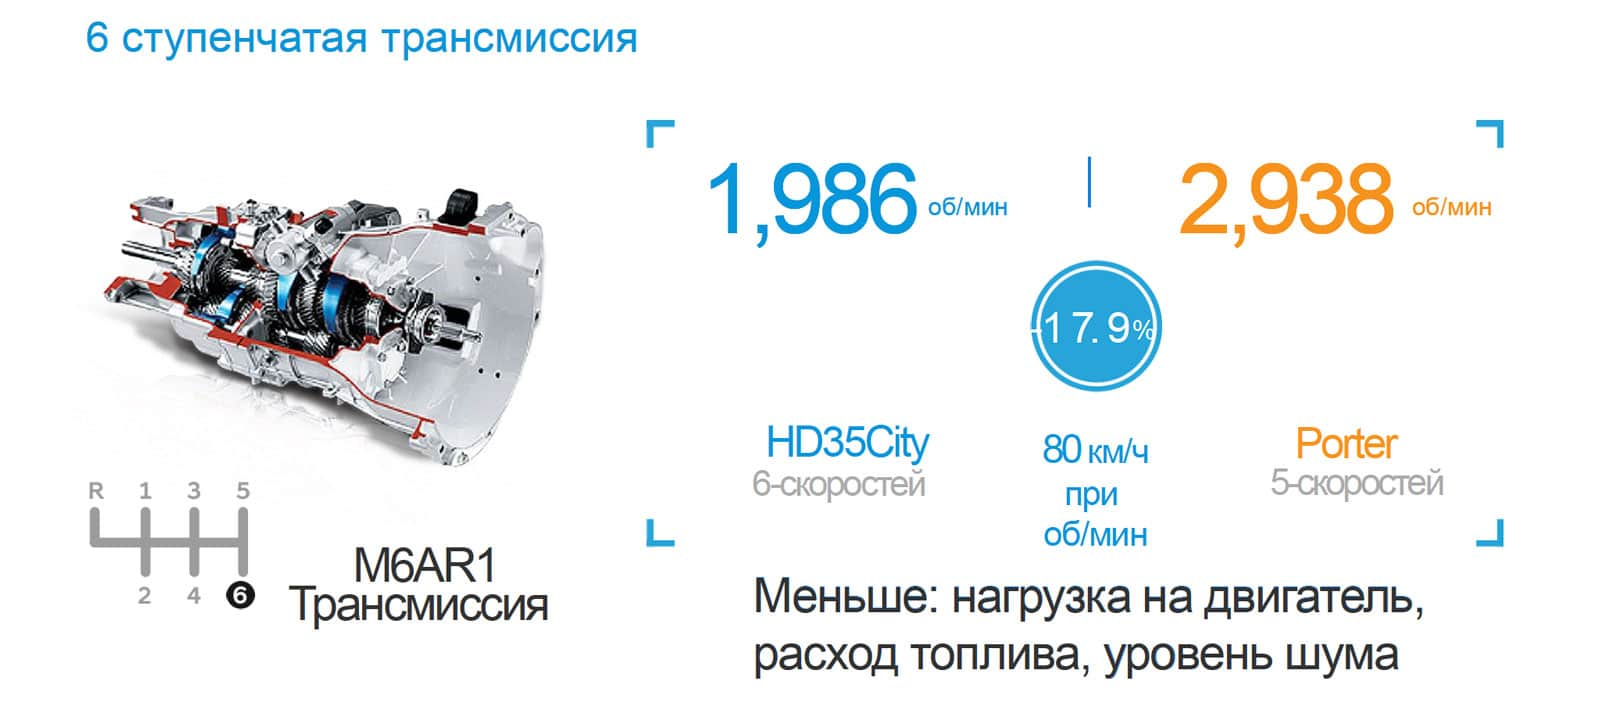 Hyundai HD35 city